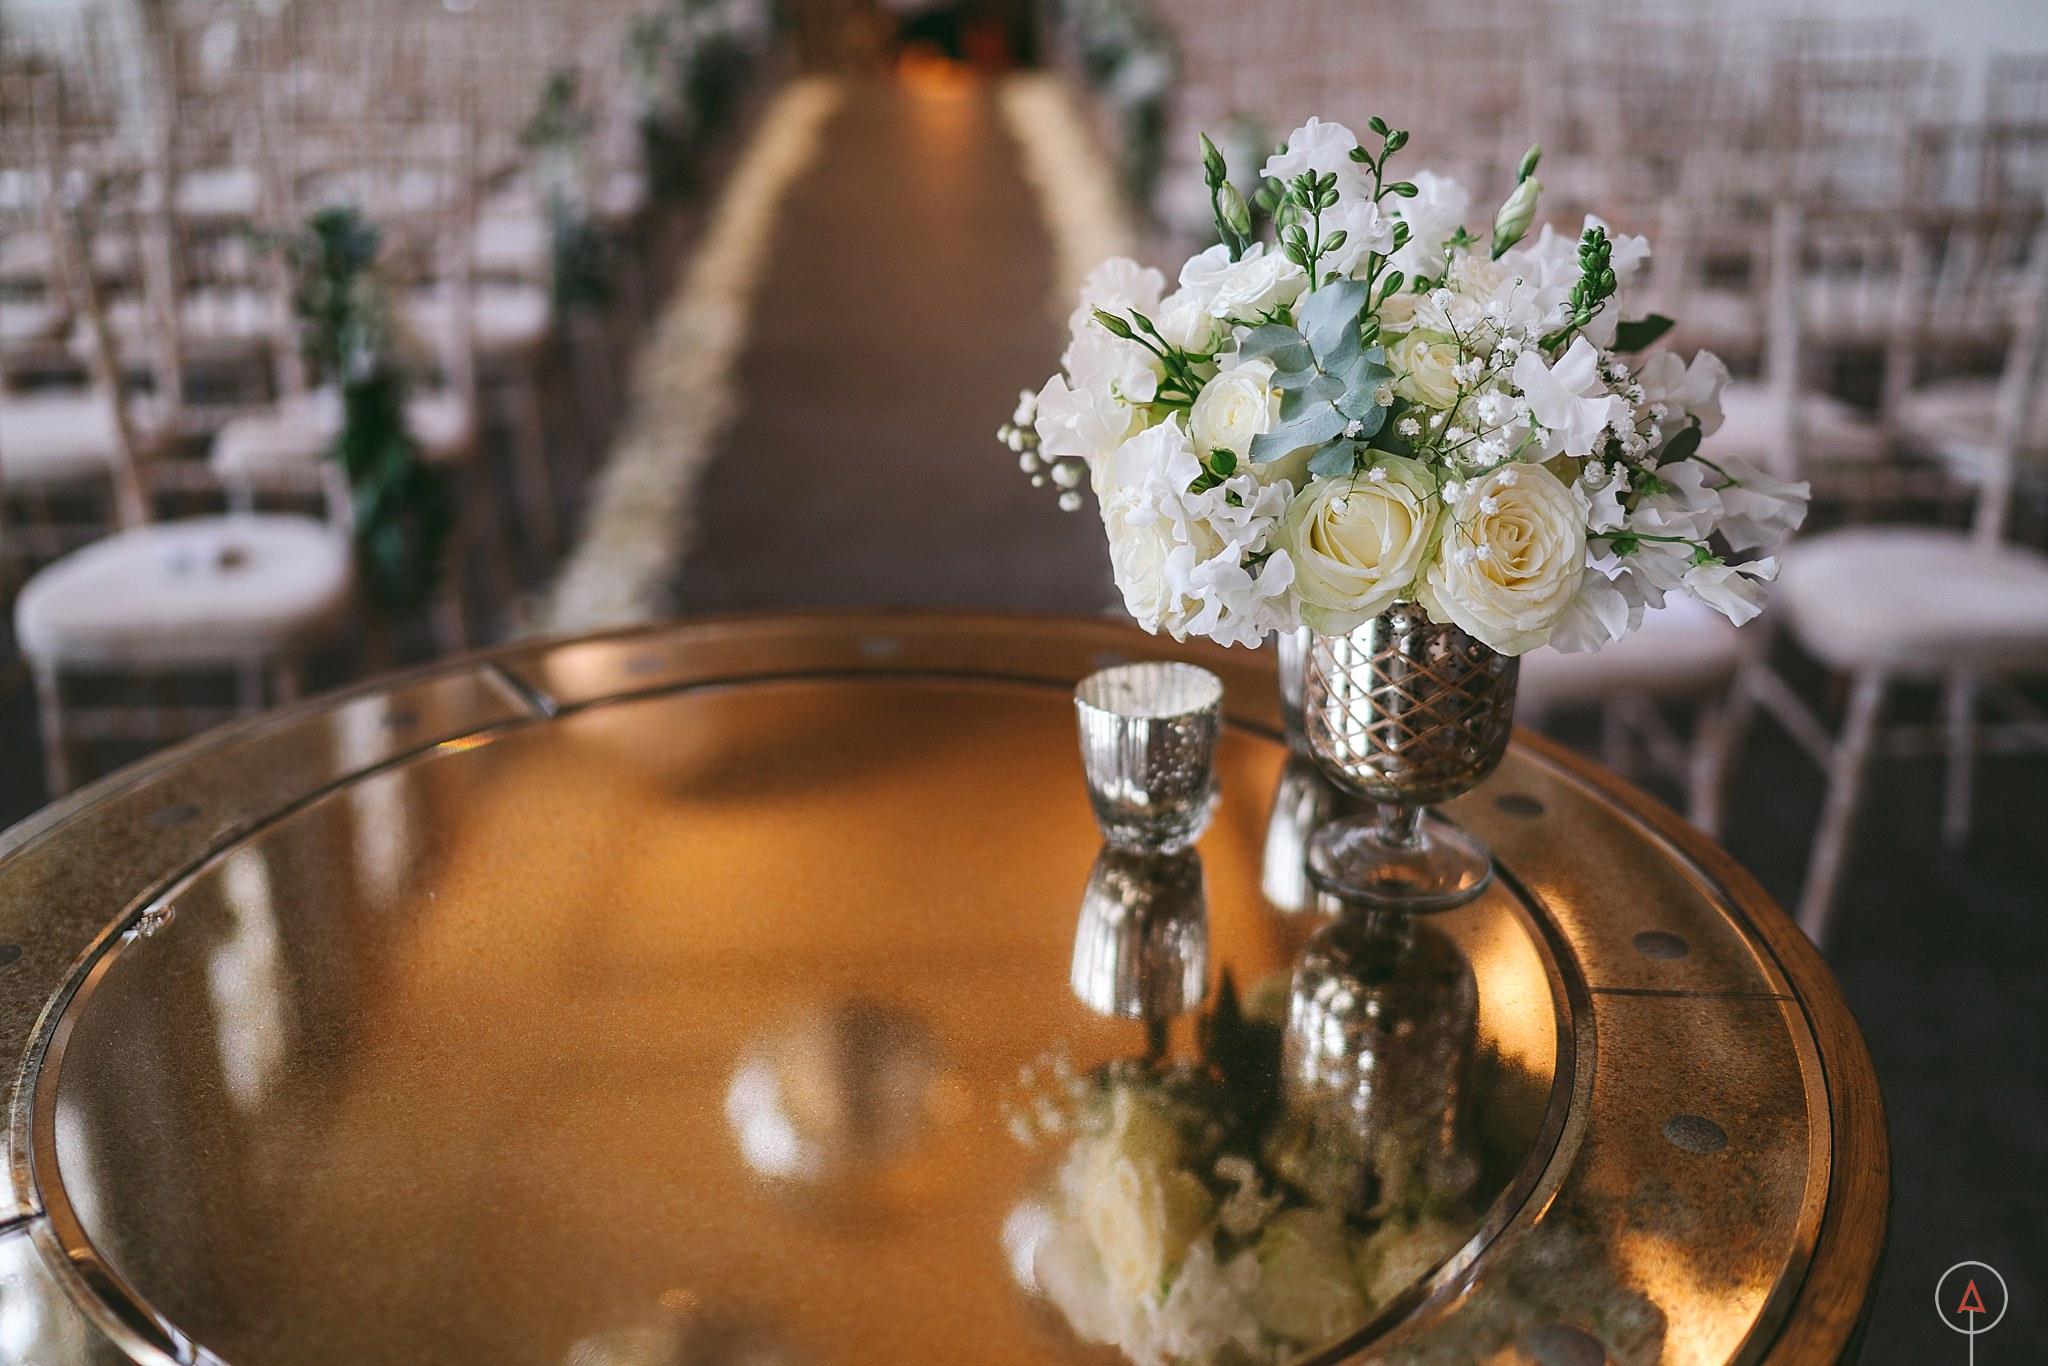 cardiff-wedding-photographer-aga-tomaszek_0207